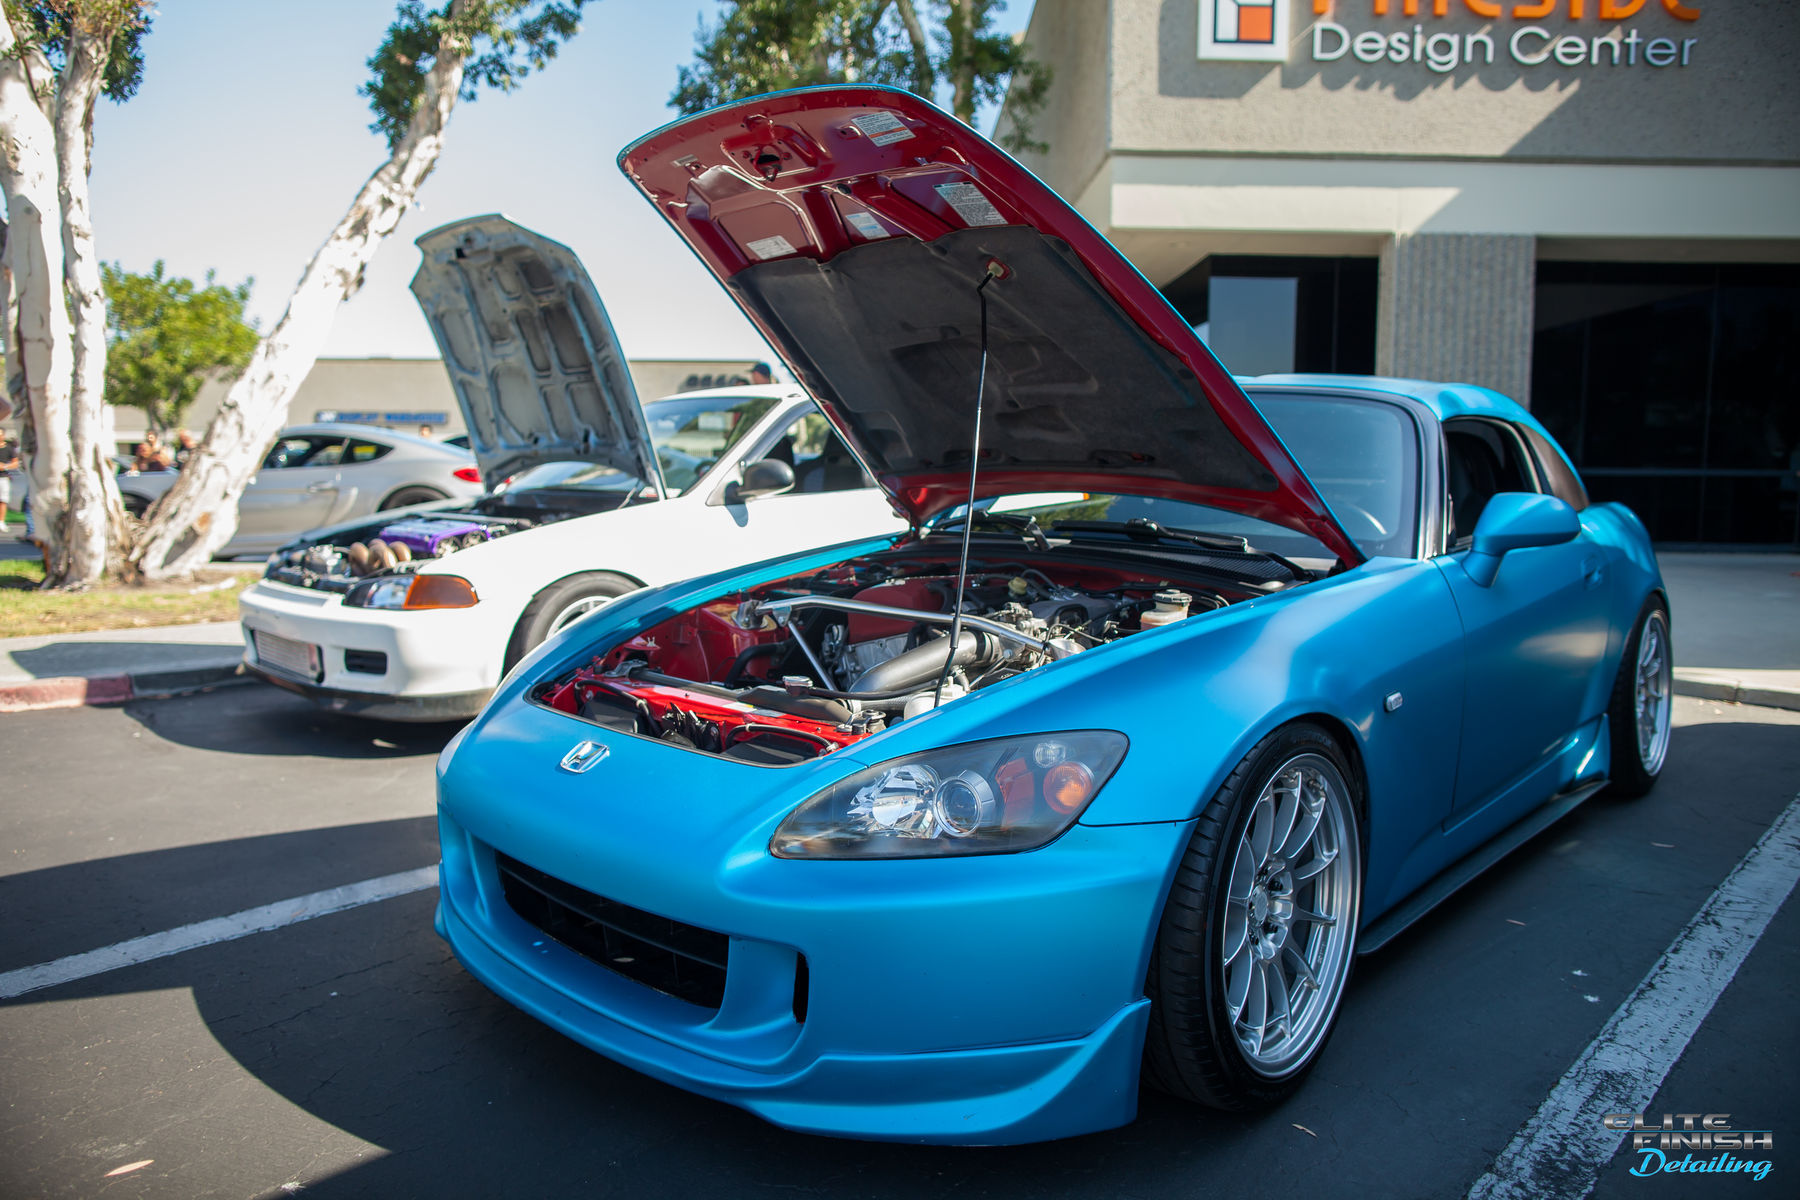 Honda S2000 | San Diego Cars & Coffee August 13th, 2016